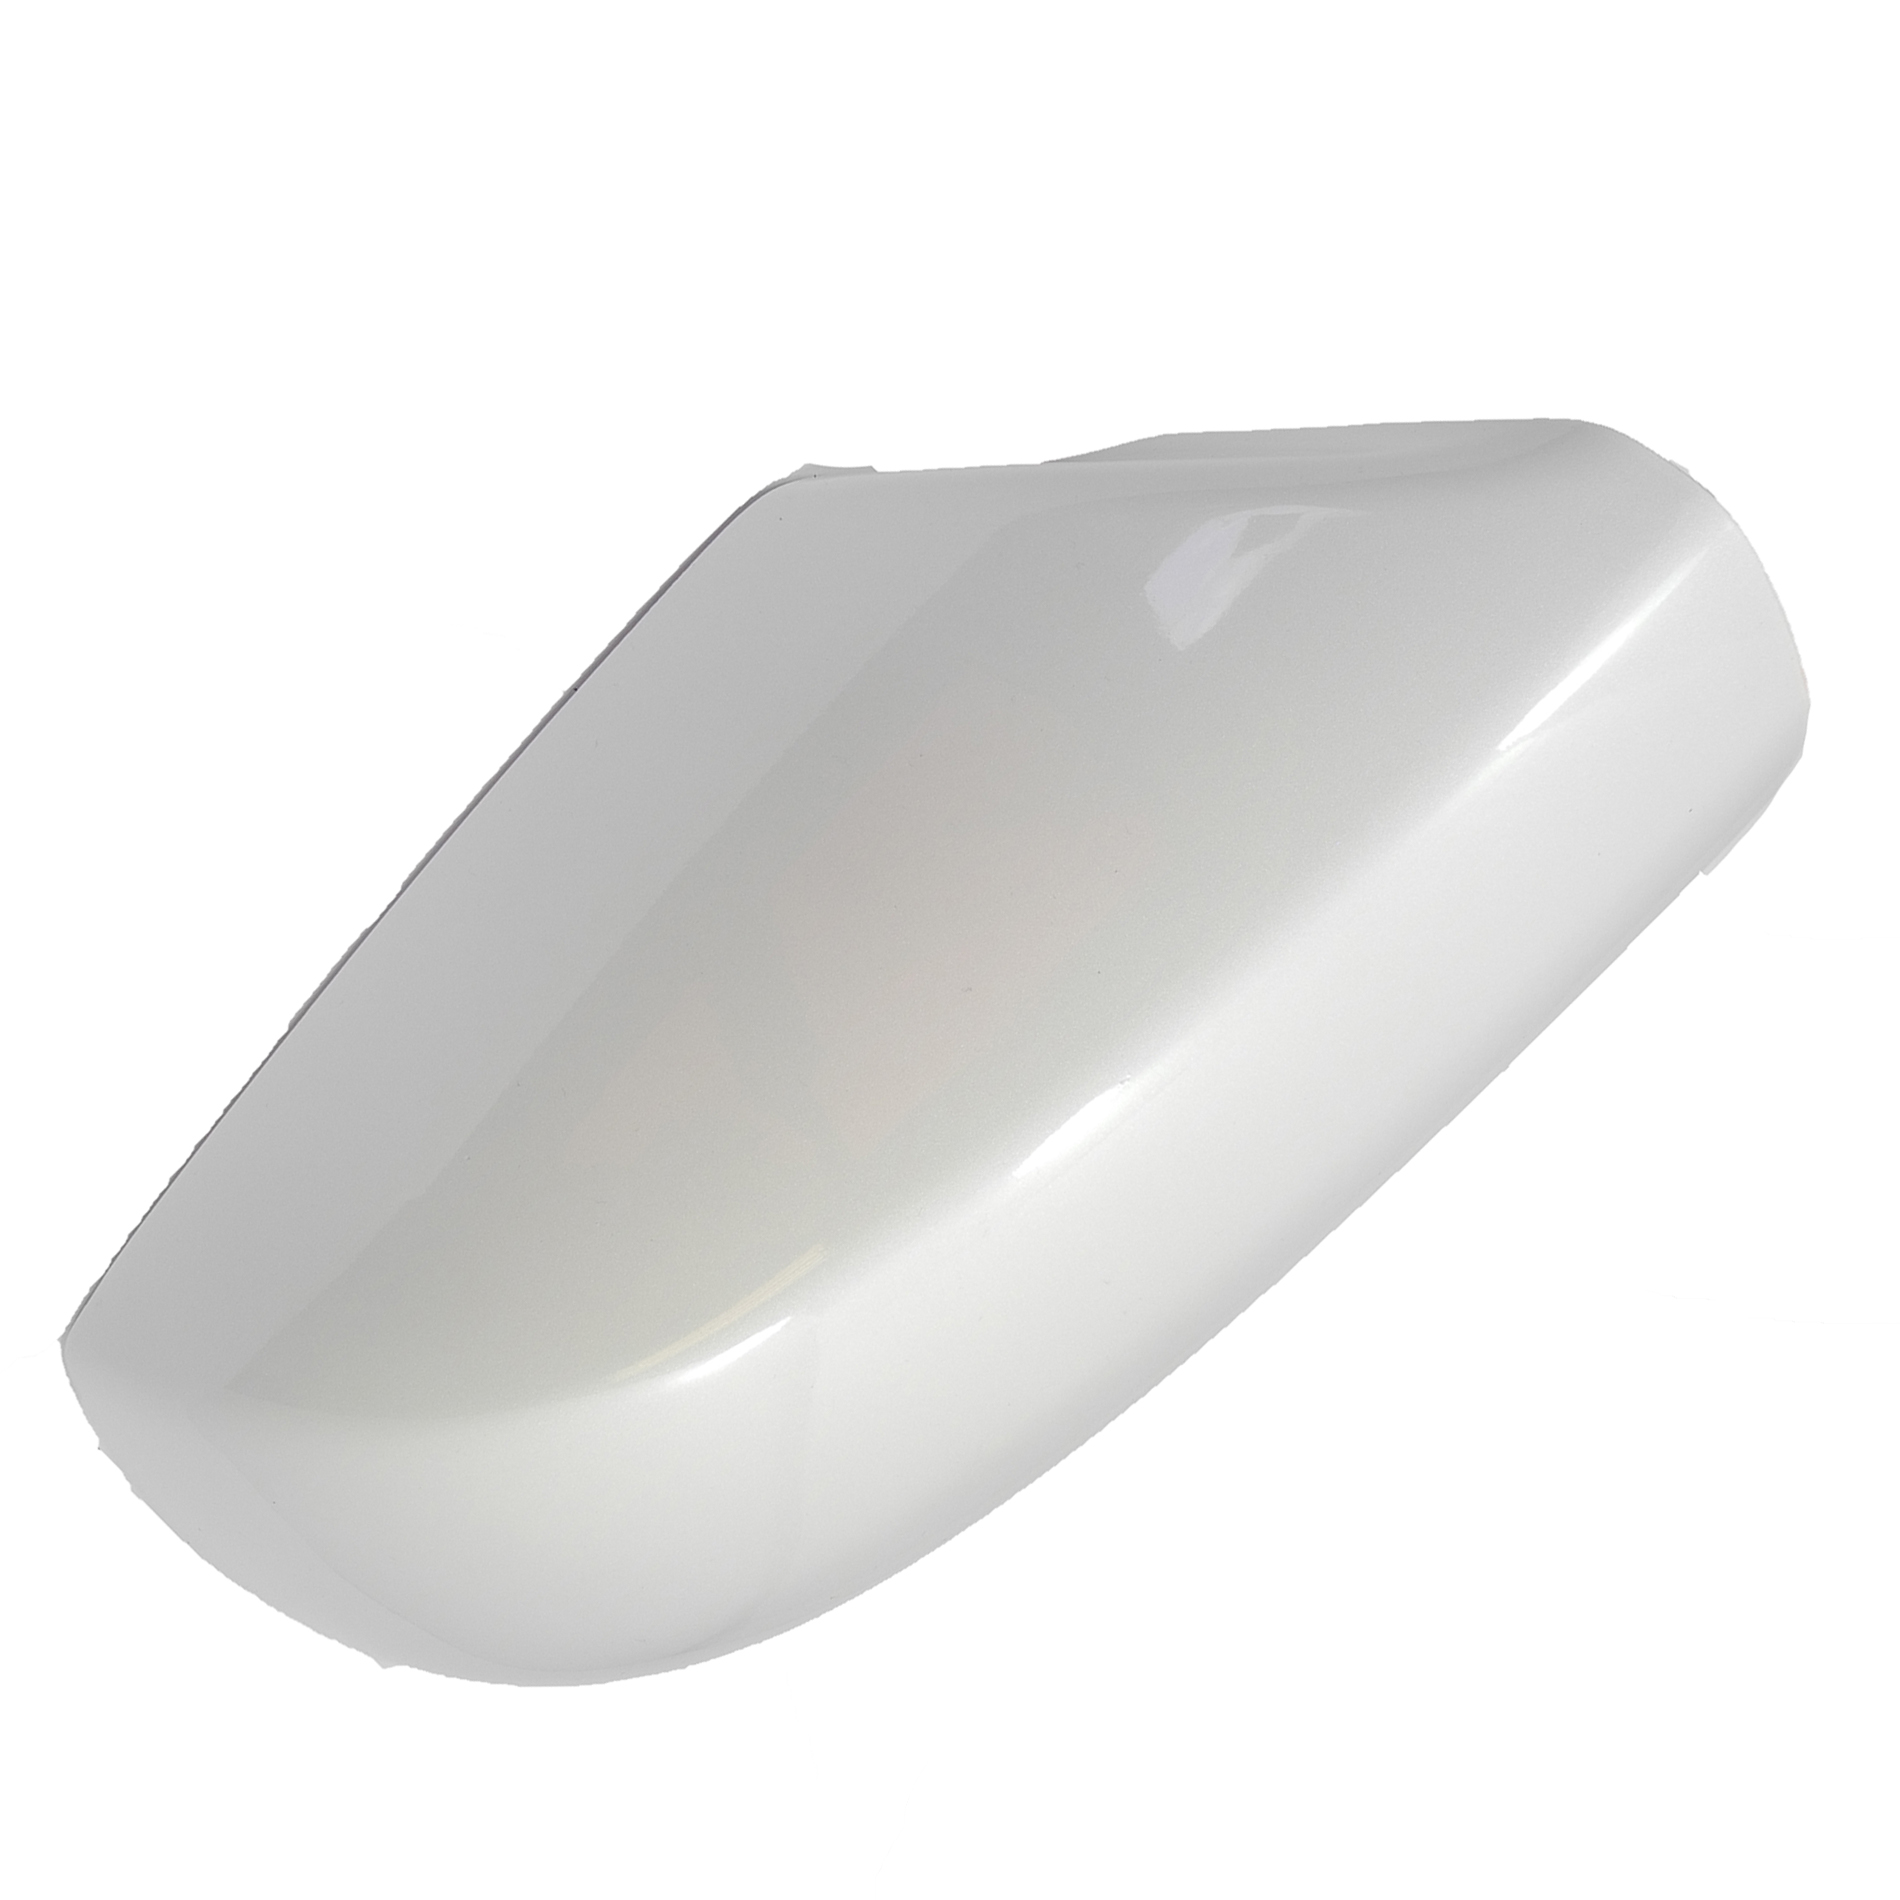 Cover B750 For 07-2012 Nissan Altima 2.5L White QX3 Right Passenger Mirror Cap